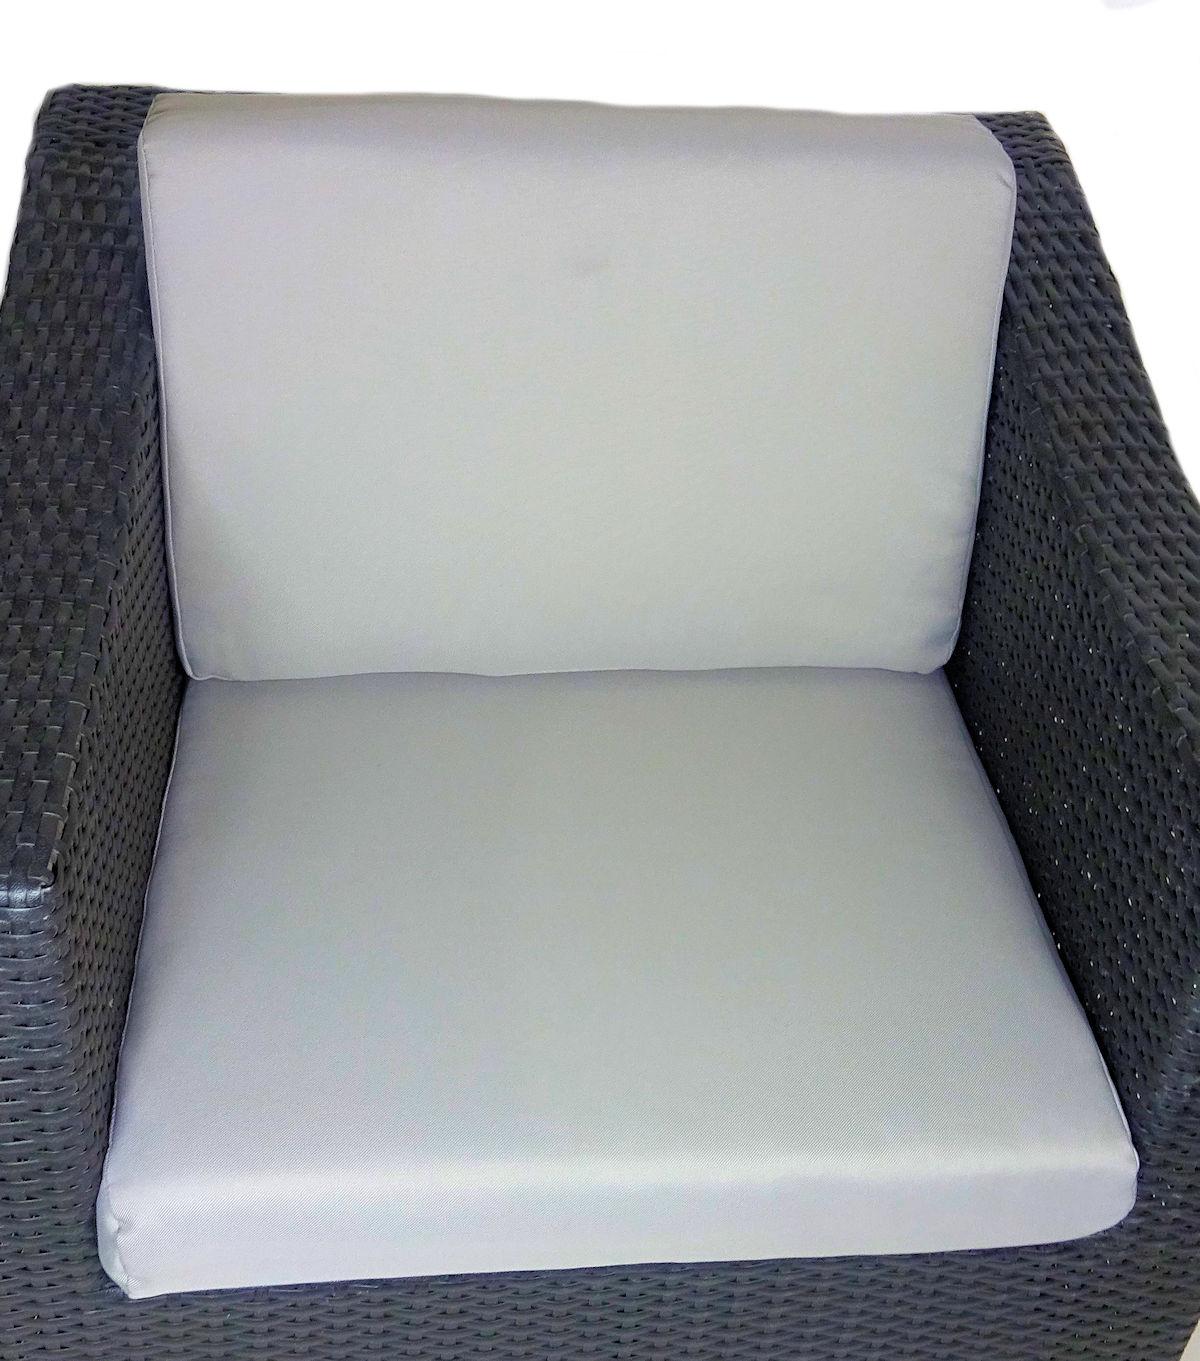 kissen polster f r pe rattanm bel san remo set sitz r cken stoff 419. Black Bedroom Furniture Sets. Home Design Ideas